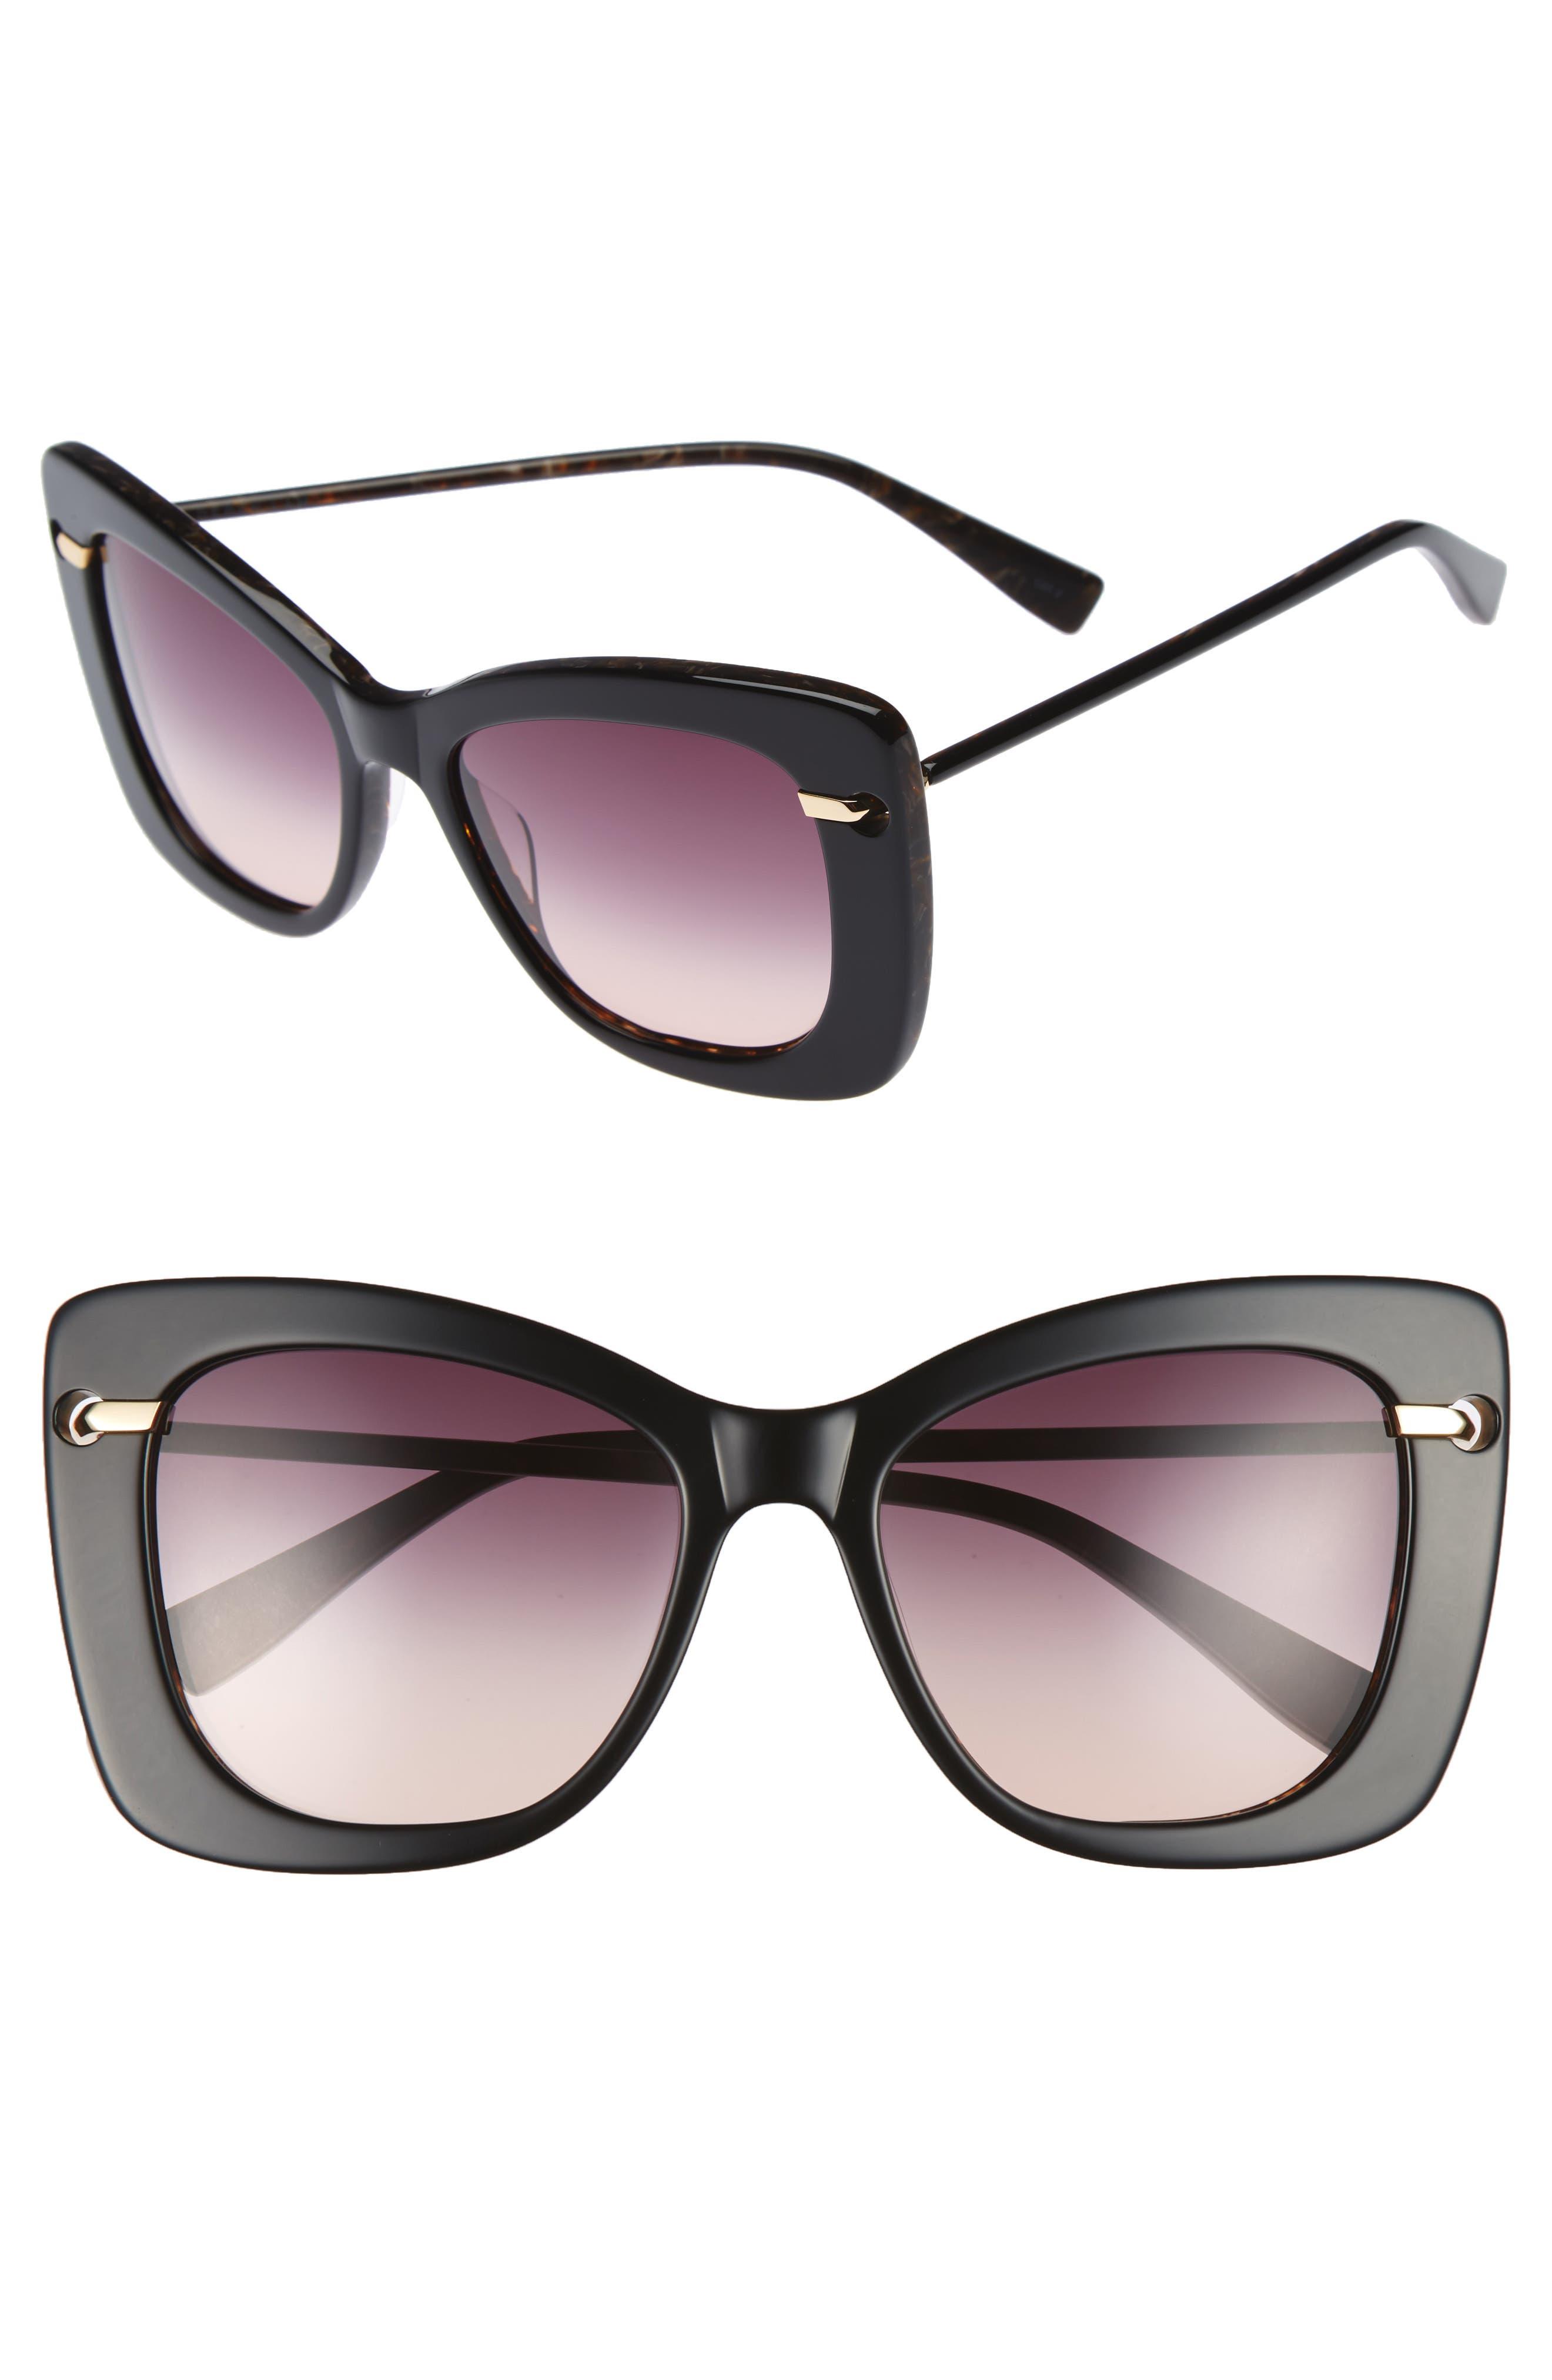 DEREK LAM,                             Clara 55mm Gradient Sunglasses,                             Main thumbnail 1, color,                             001